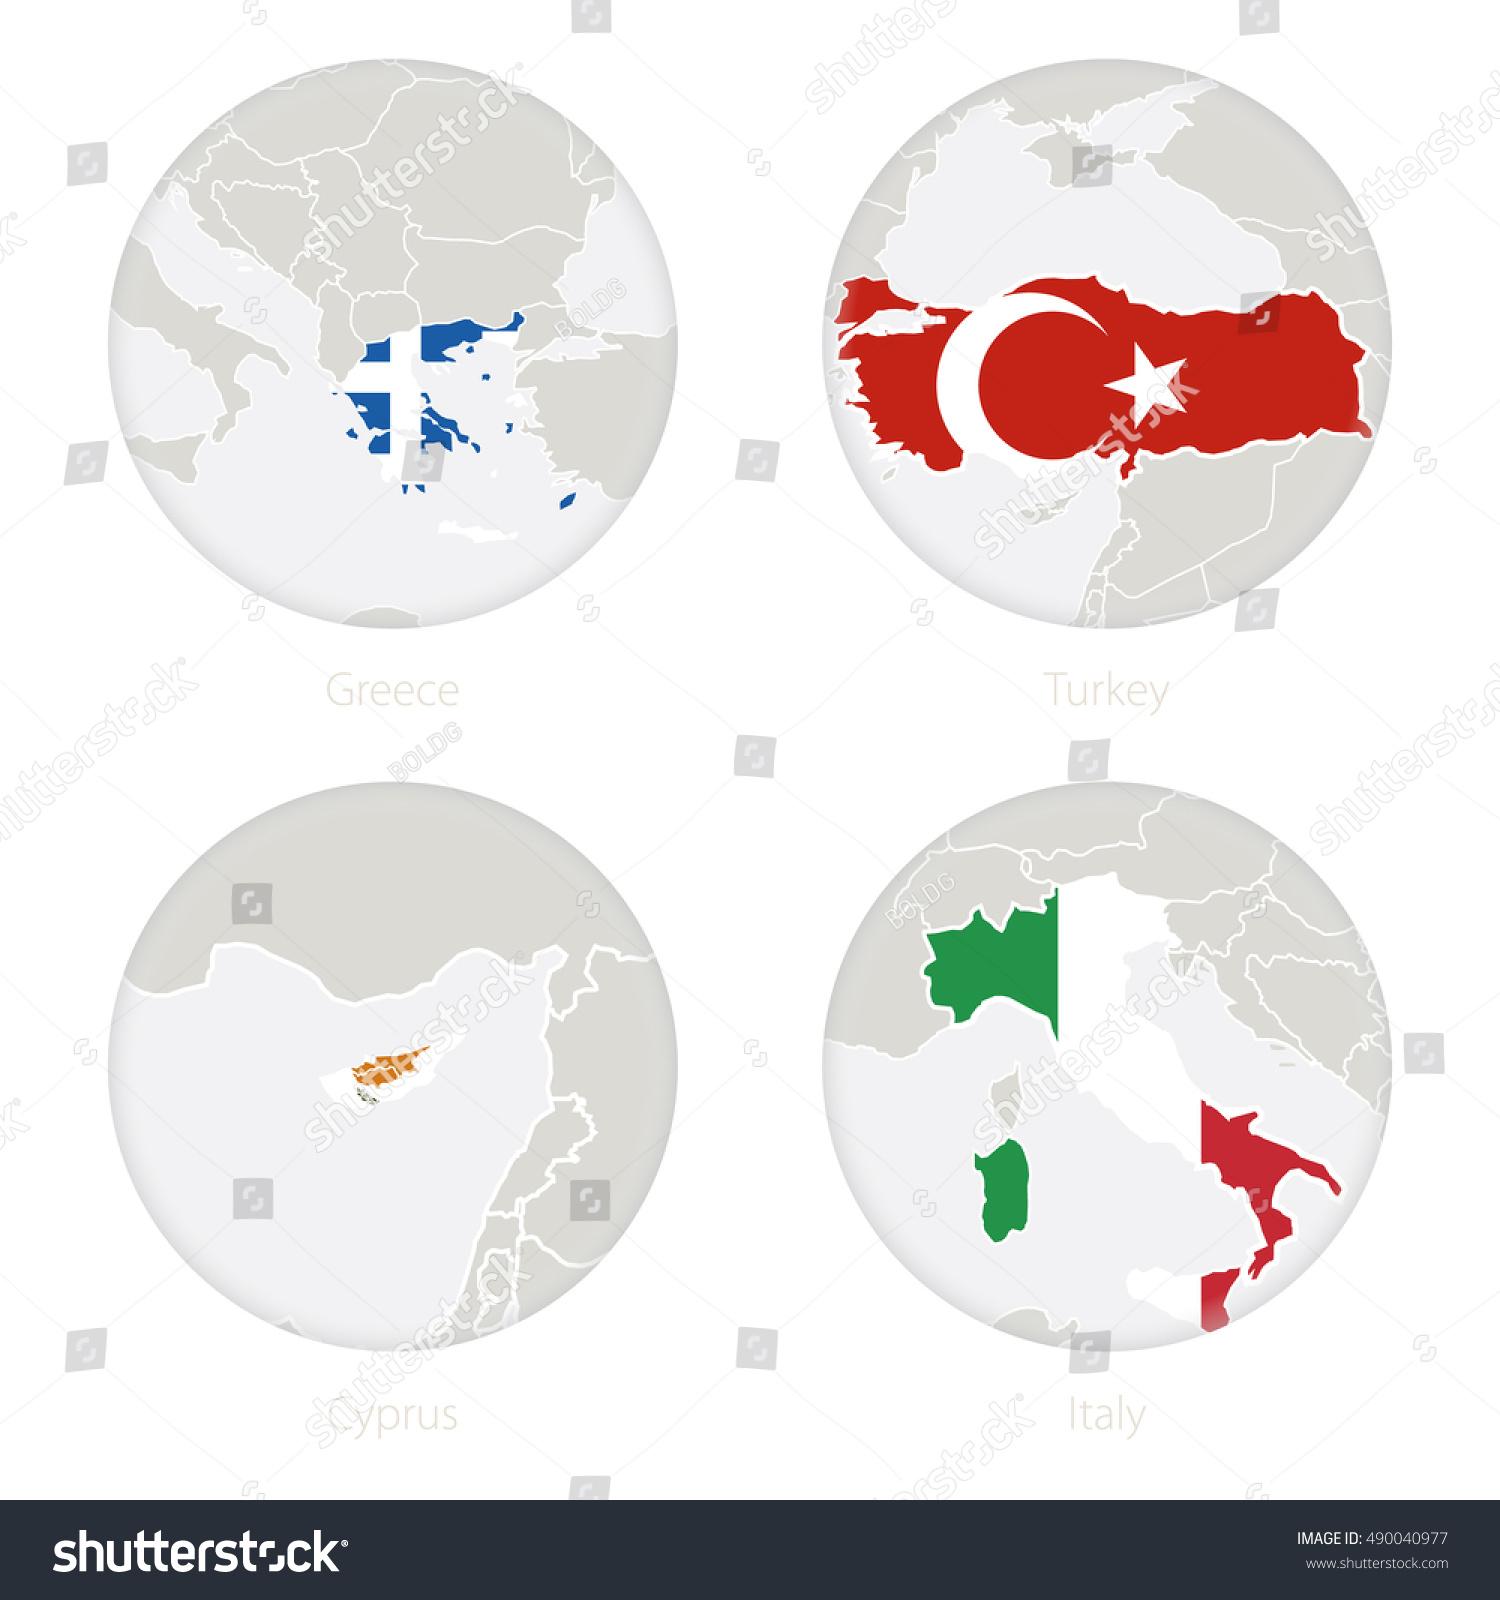 Greece Turkey Cyprus Italy Map Contour Stock Vector (Royalty Free ...